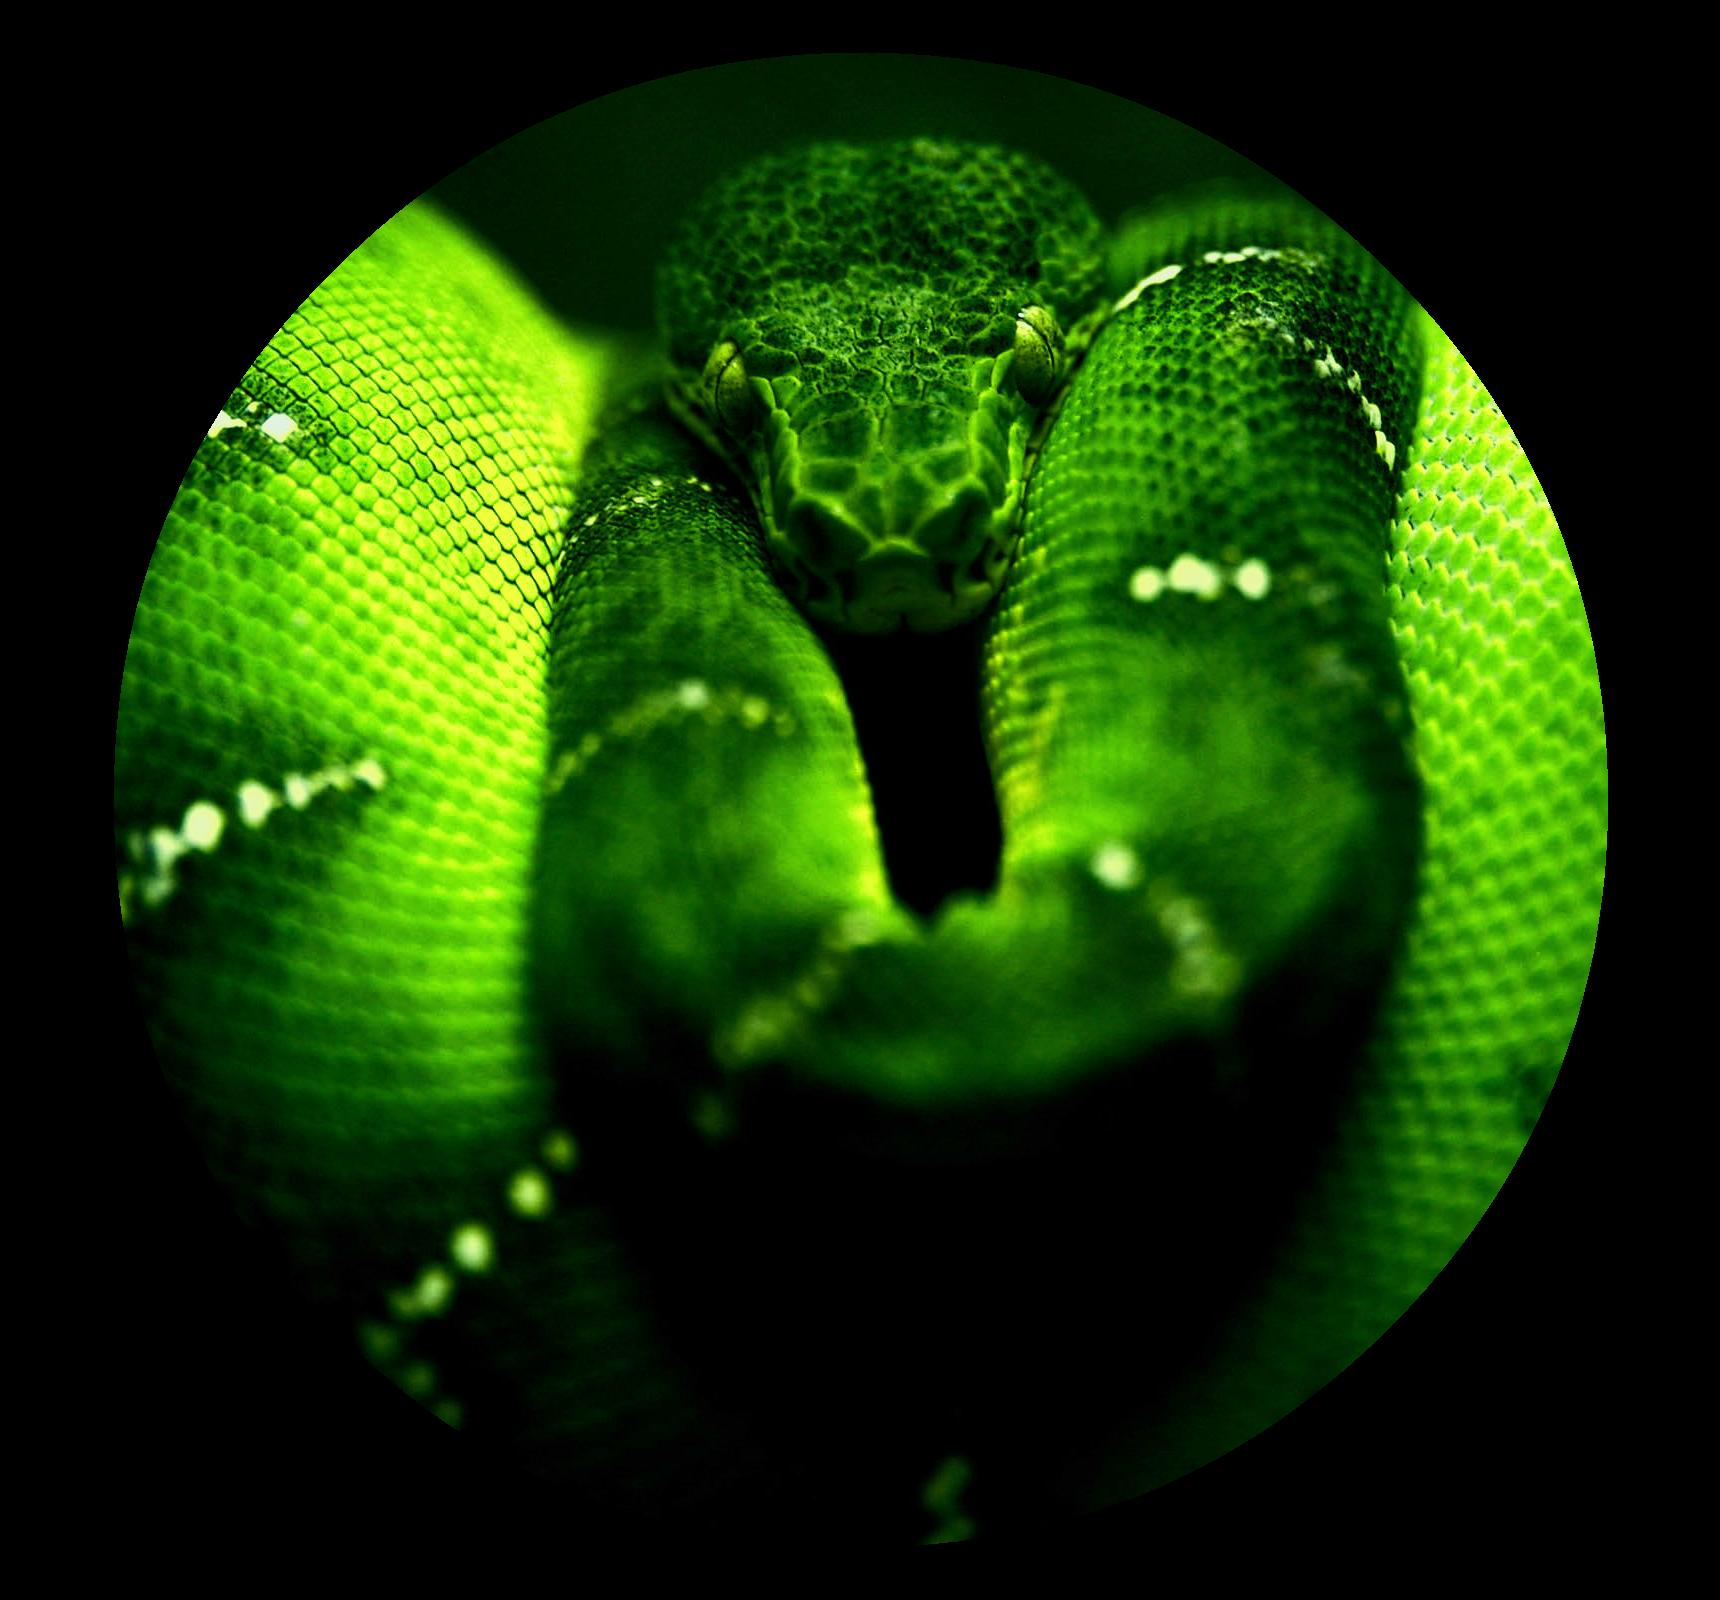 image green snake hd wallpaper free hd for desktop png animal